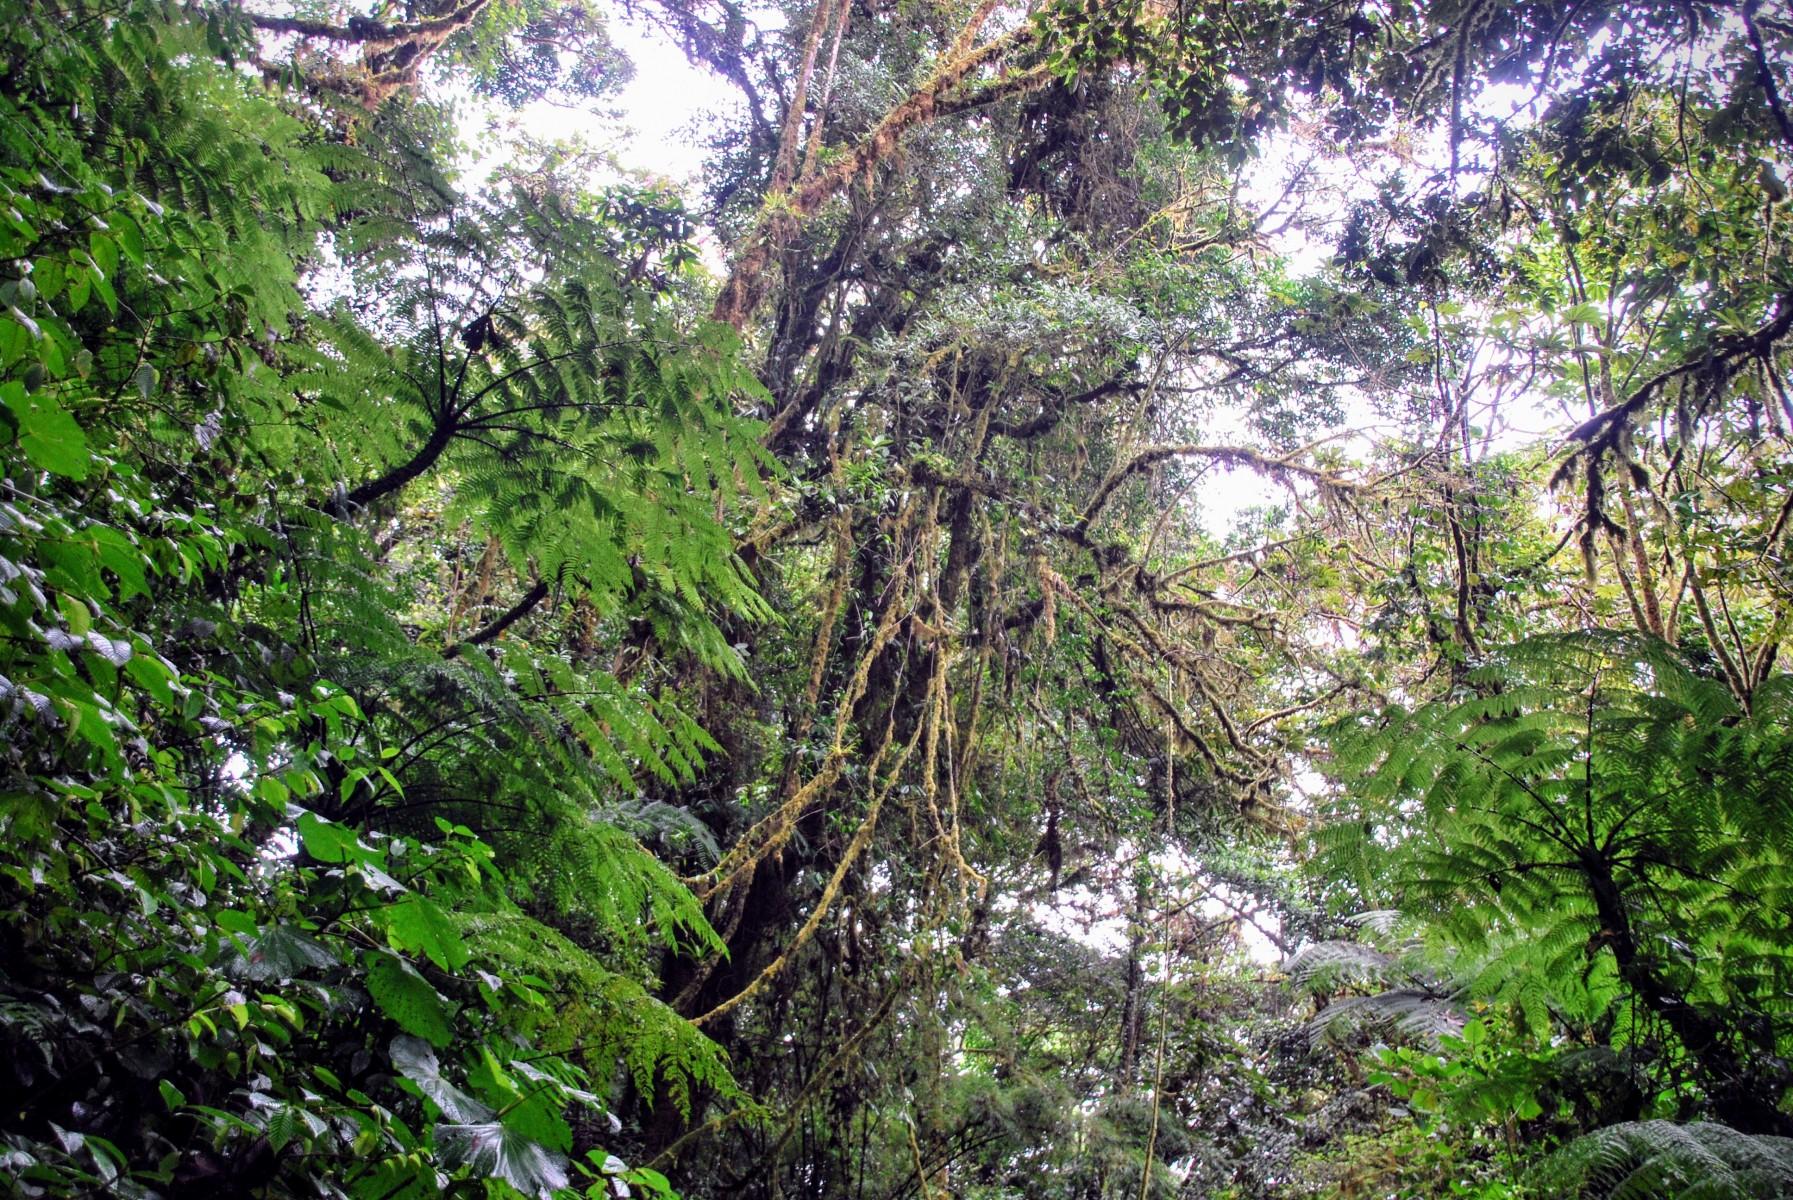 Reserva biológica Bosque Nuboso Monteverde